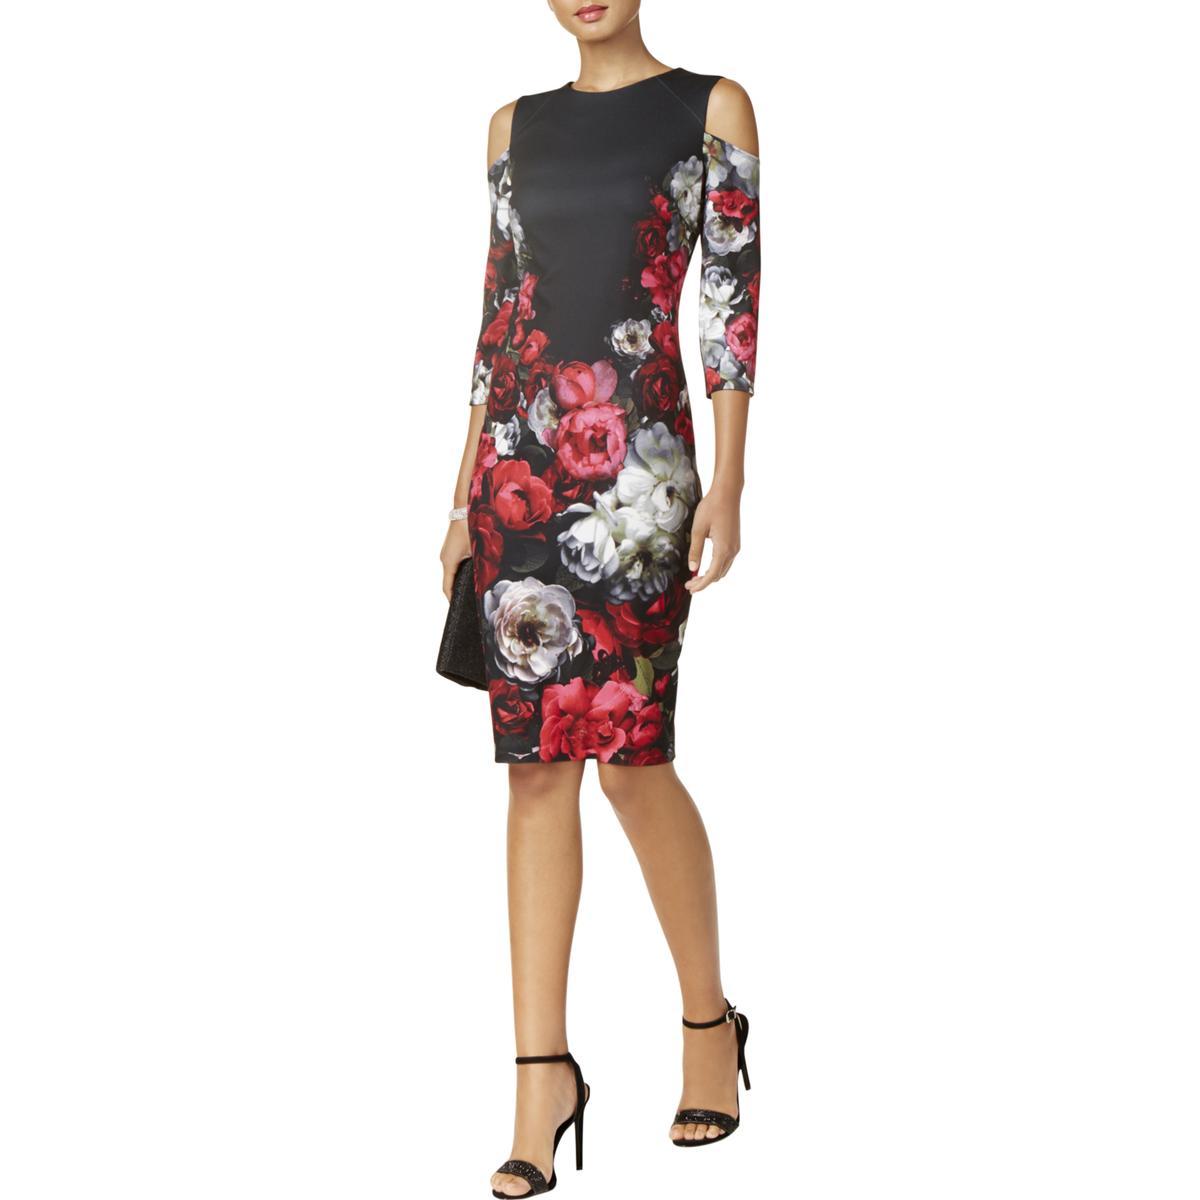 61e4b5336a7 Jax Black Label Womens Black Floral Print Cold Shoulder Party Dress ...